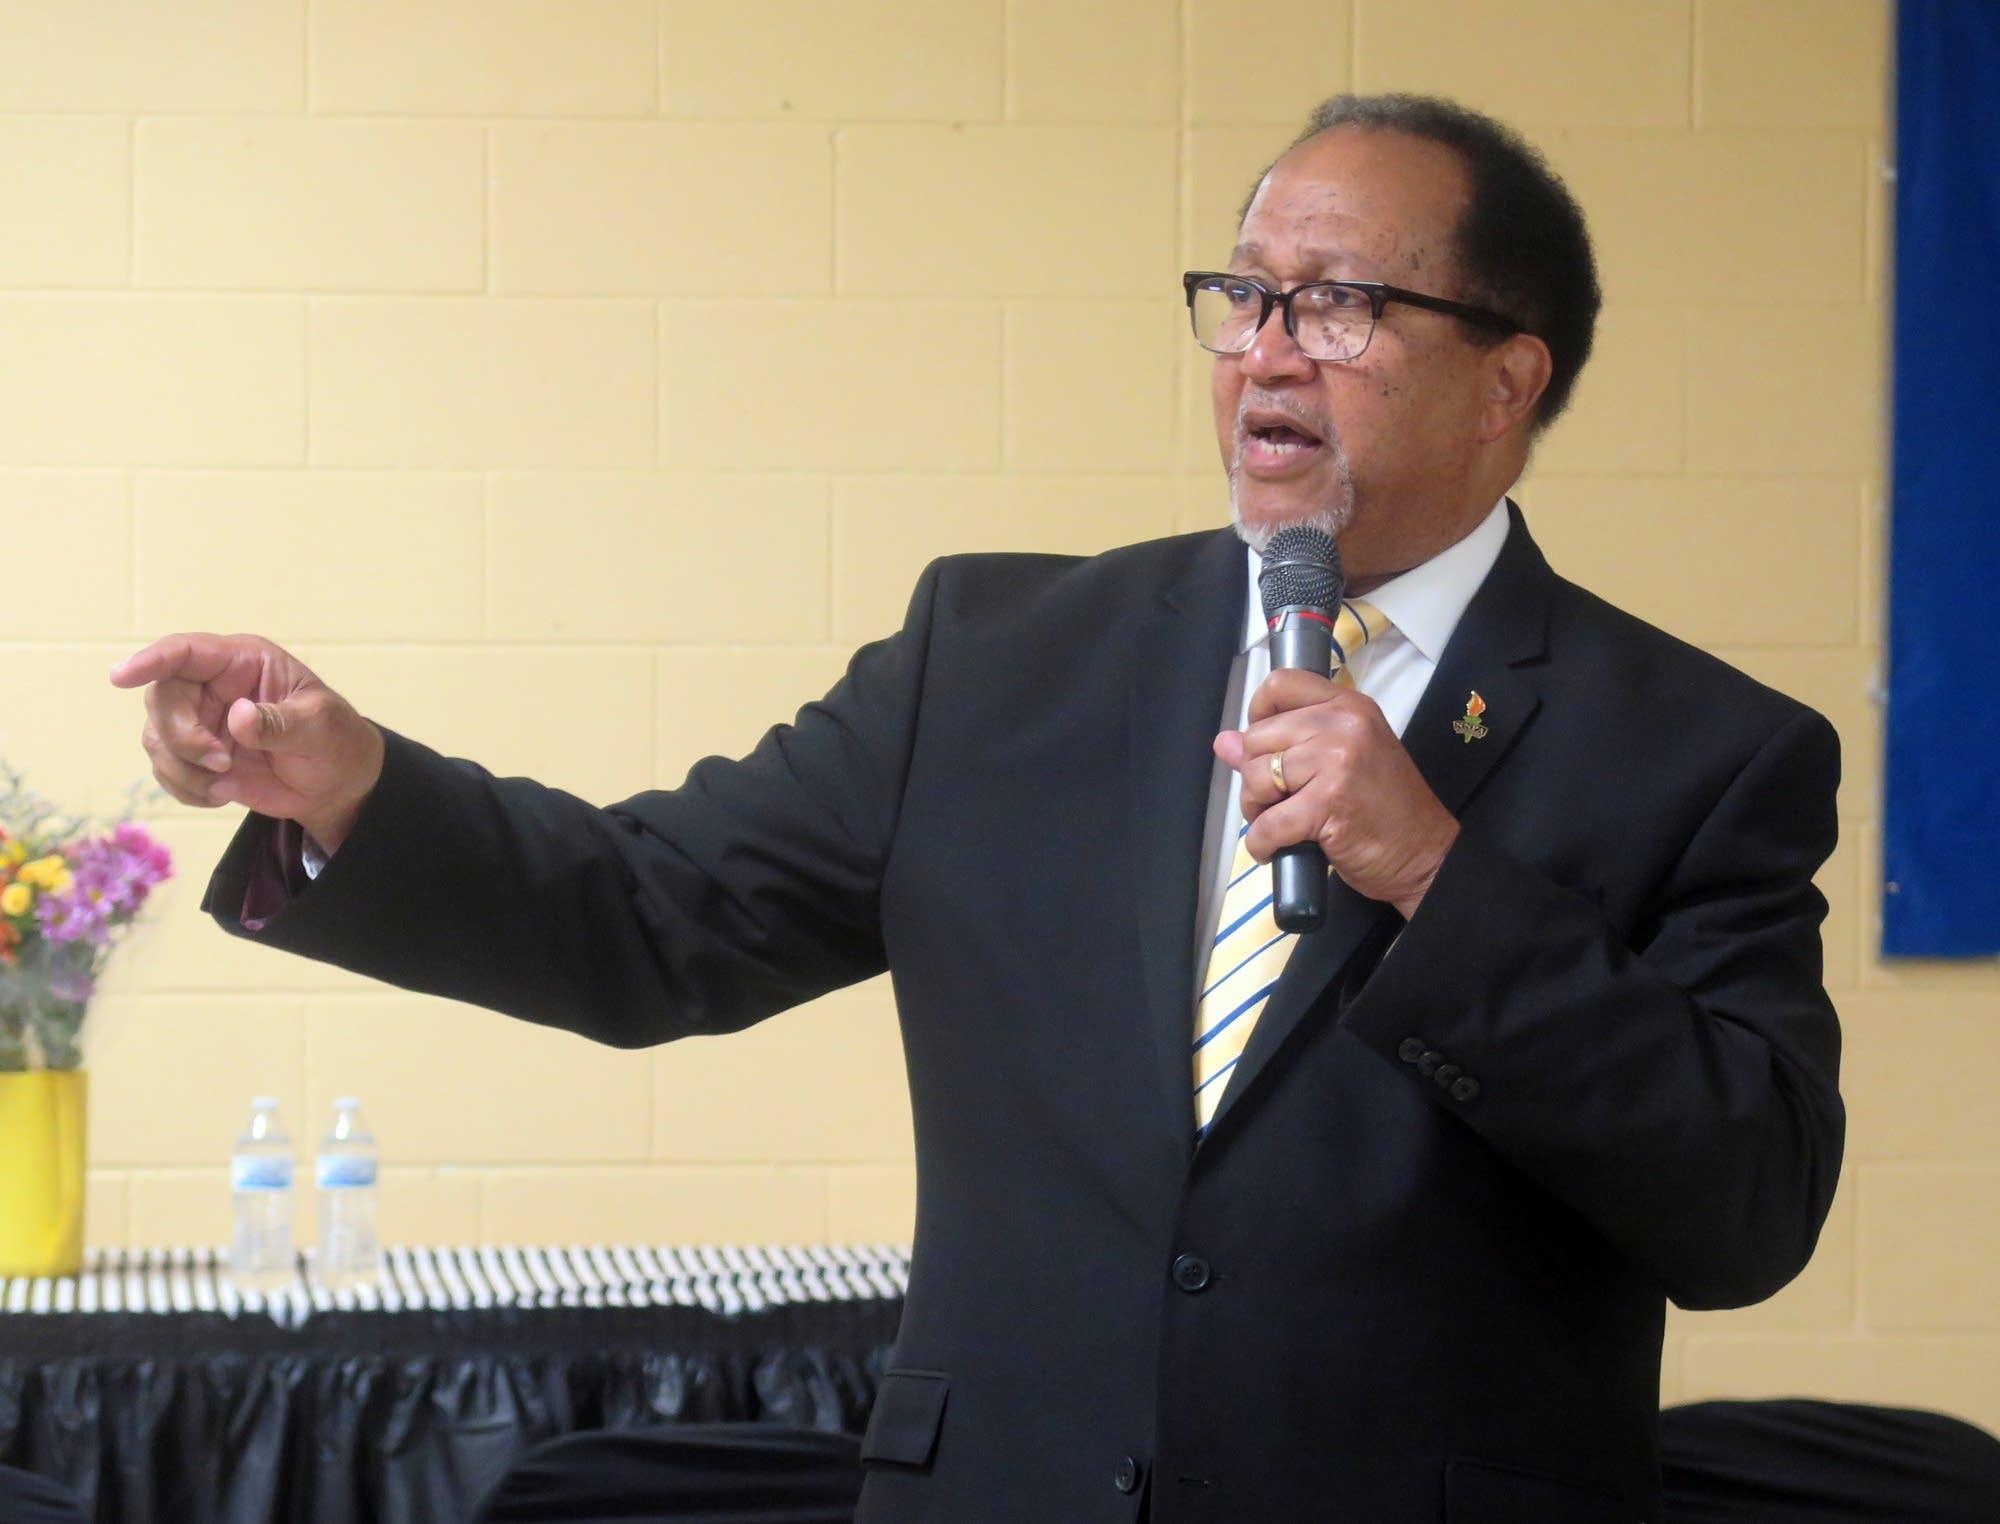 Ben Chavis, longtime civil rights activist, spoke at New Salem Baptist.